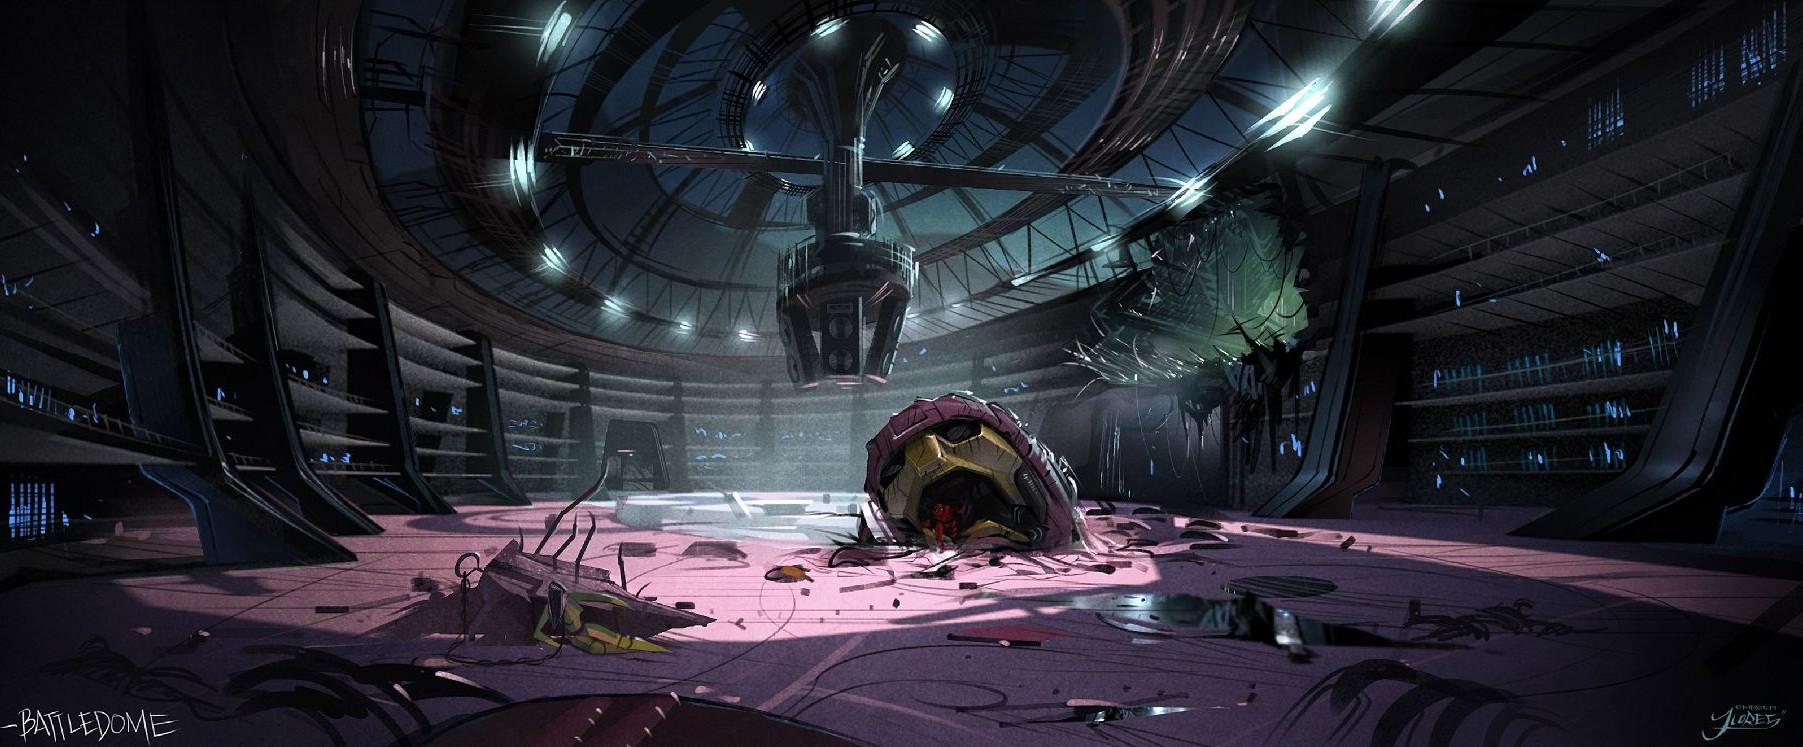 deadpool-jeu-video-image-screenshot20